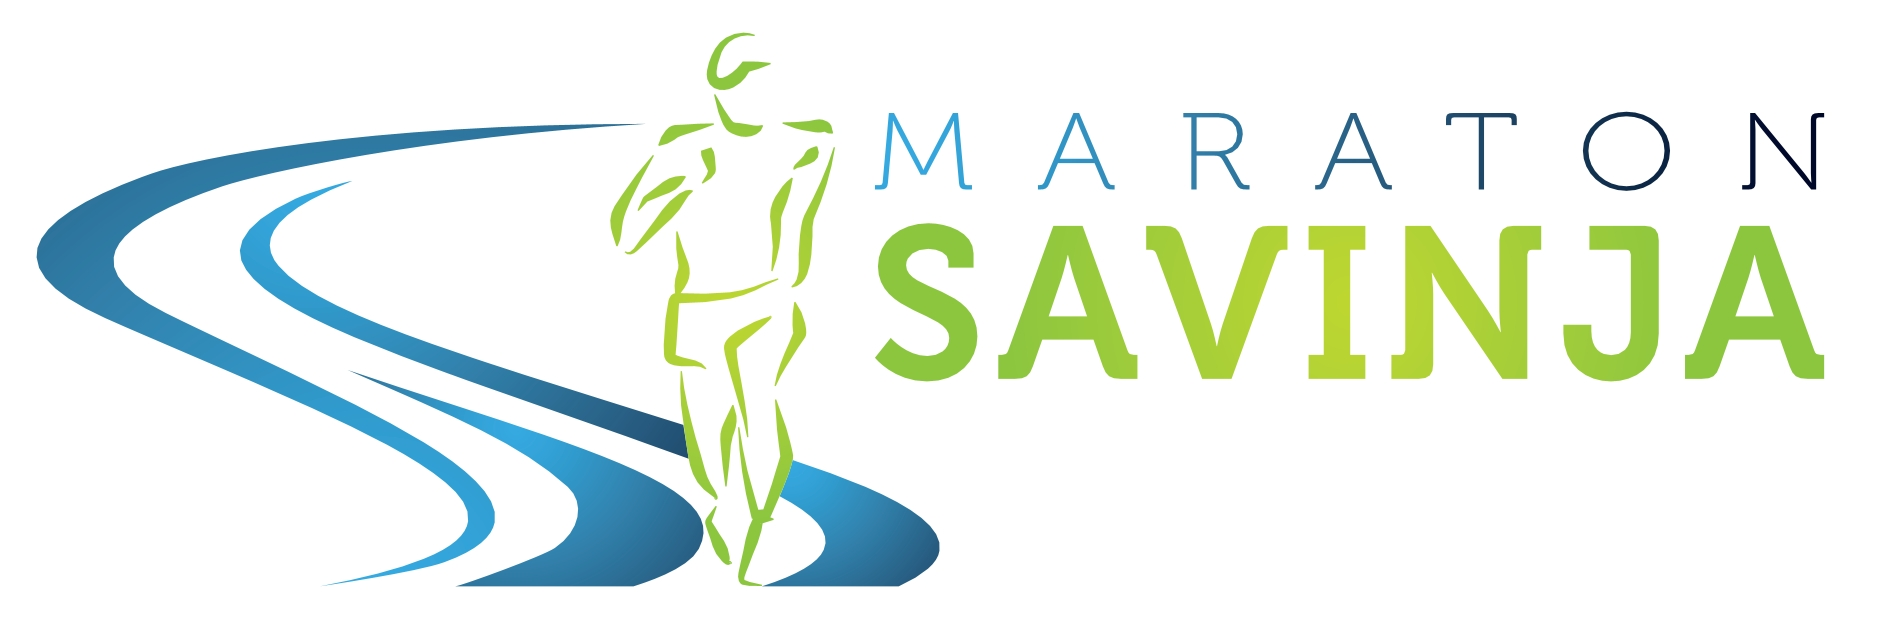 Maraton Savinja Logo